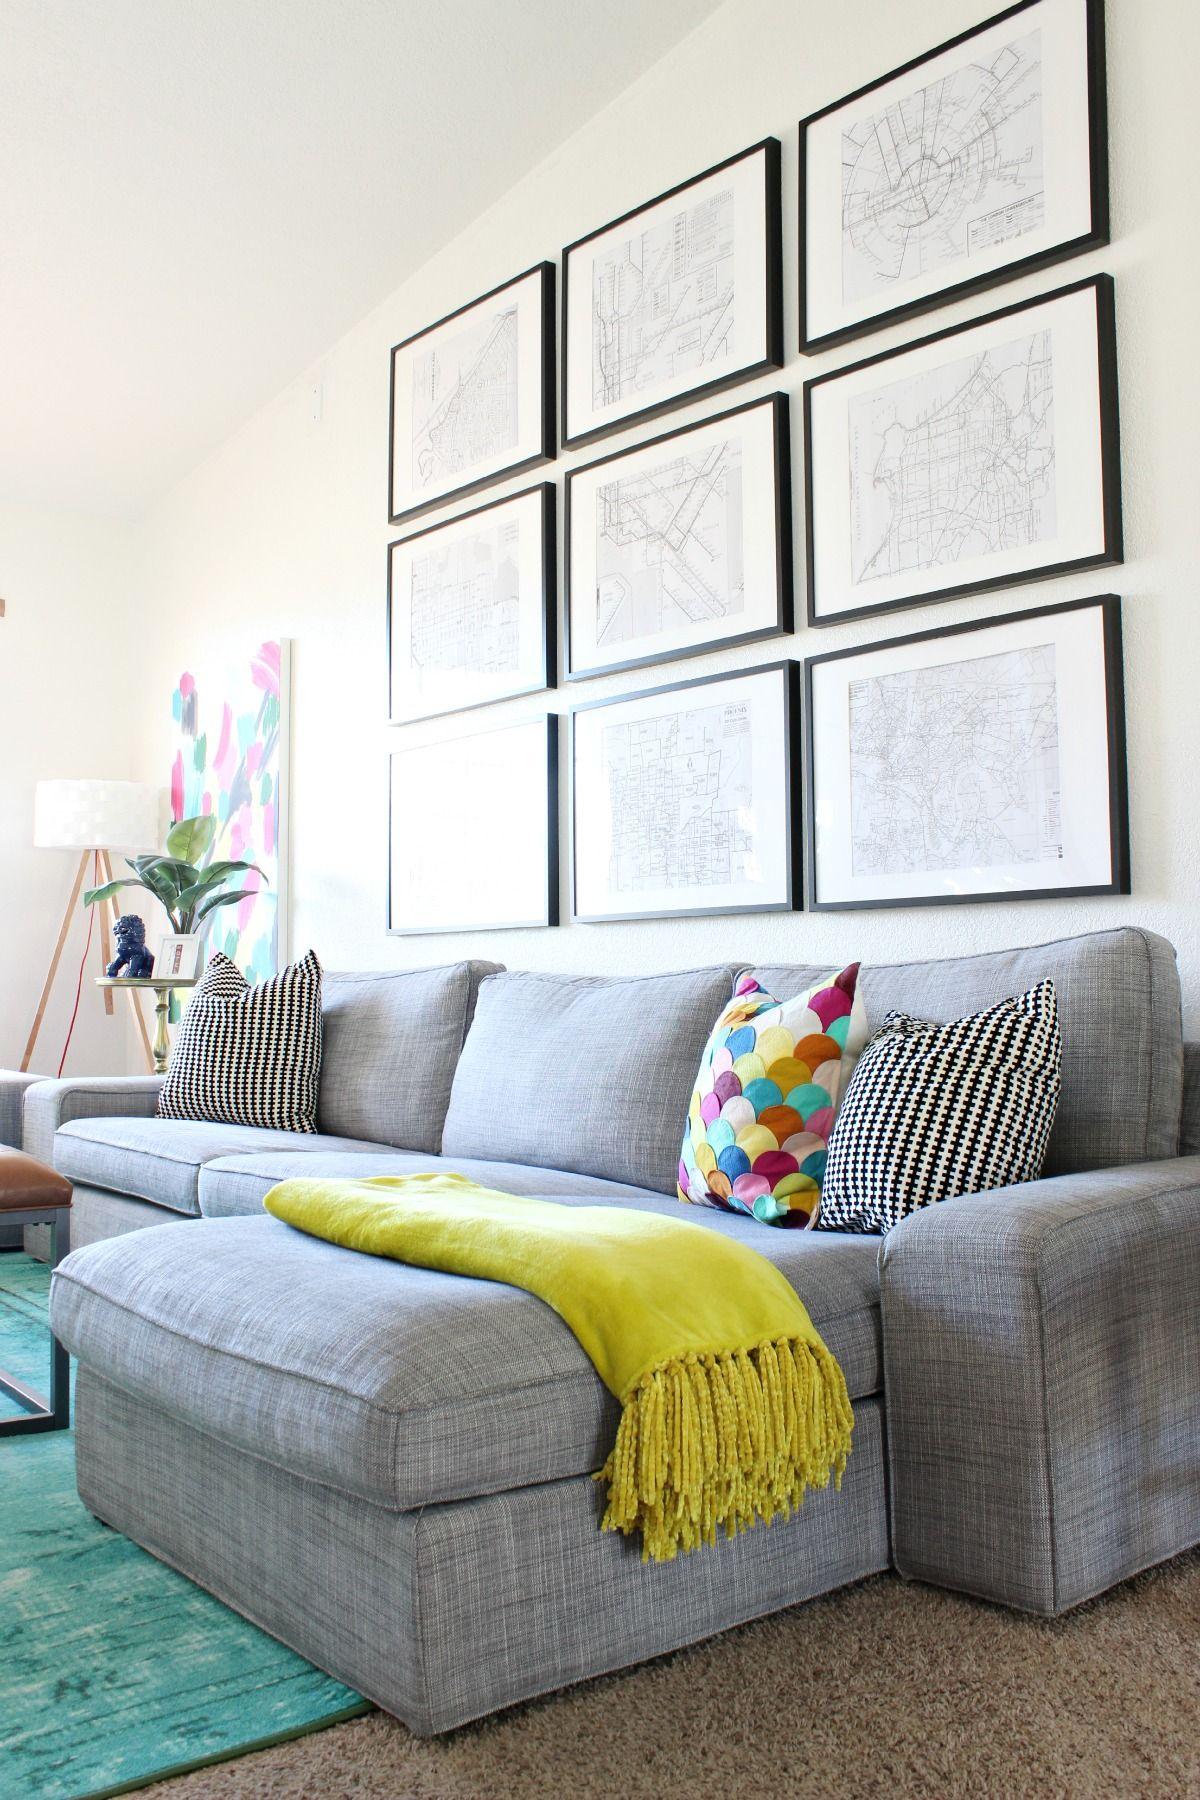 Living Room Updates and Aqua Antlers | Pinterest | Framed maps ...